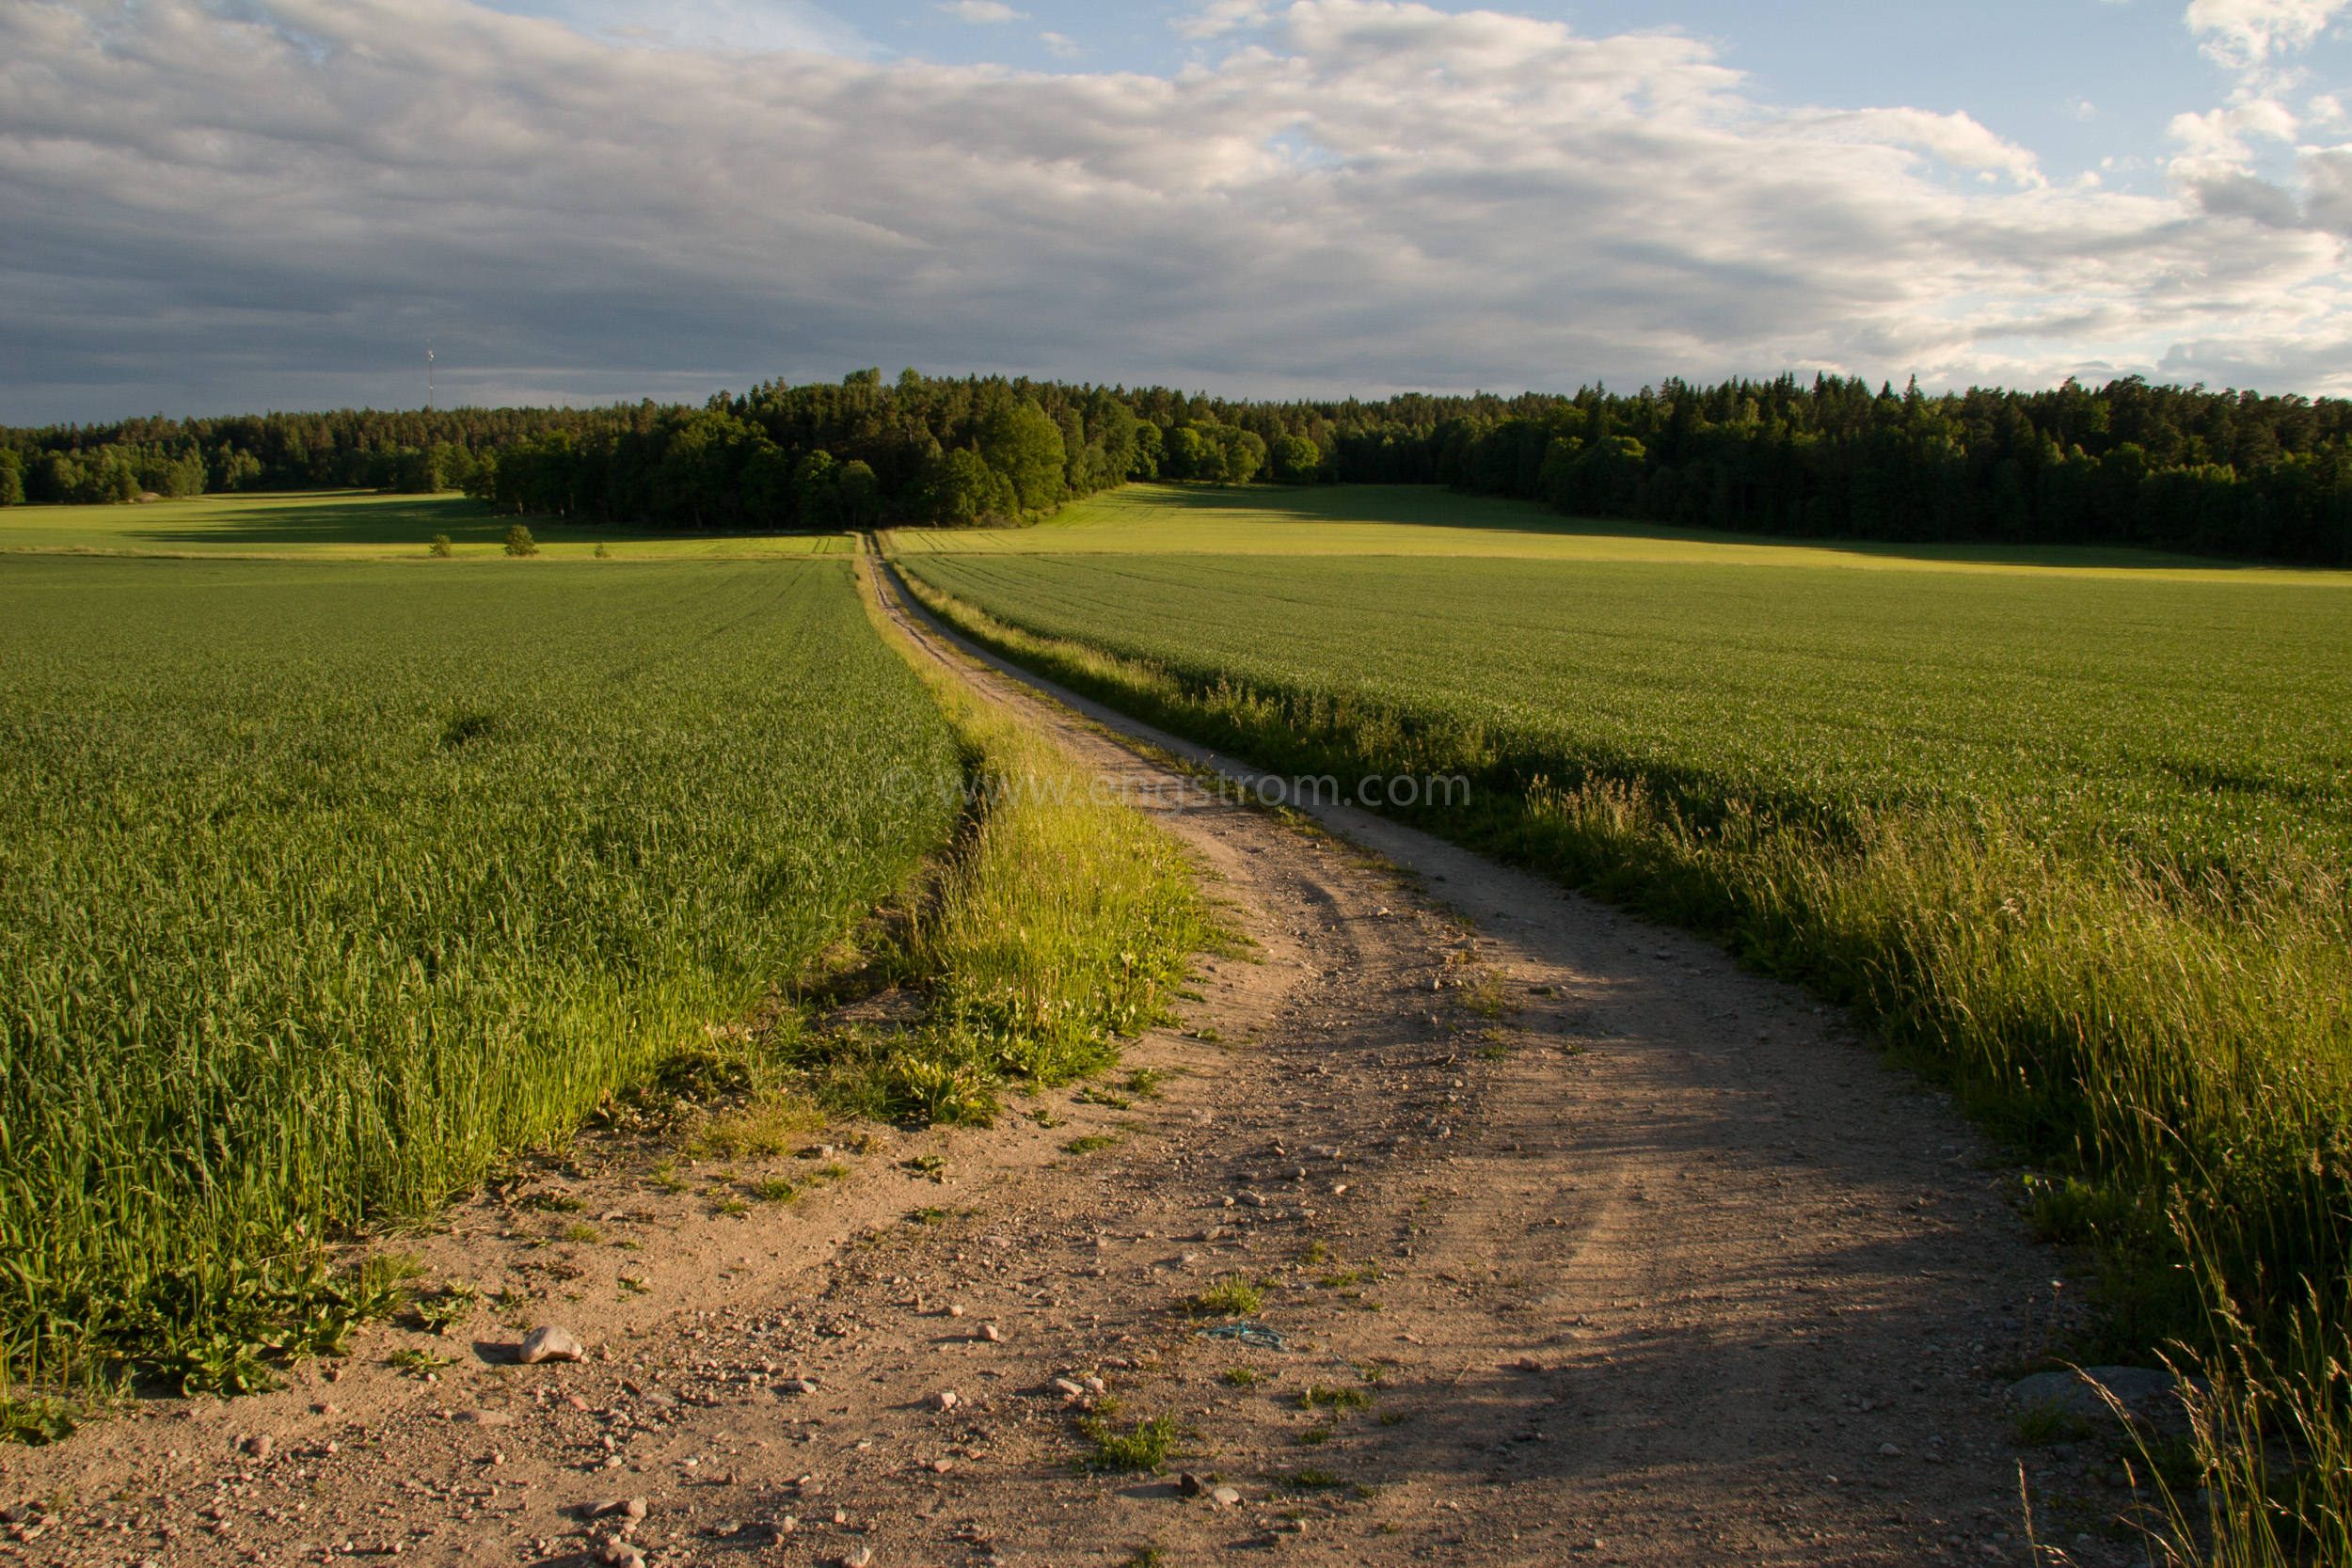 JE_4140, Grusväg mellan två åkrar i kvällsljus, Jonas Engström